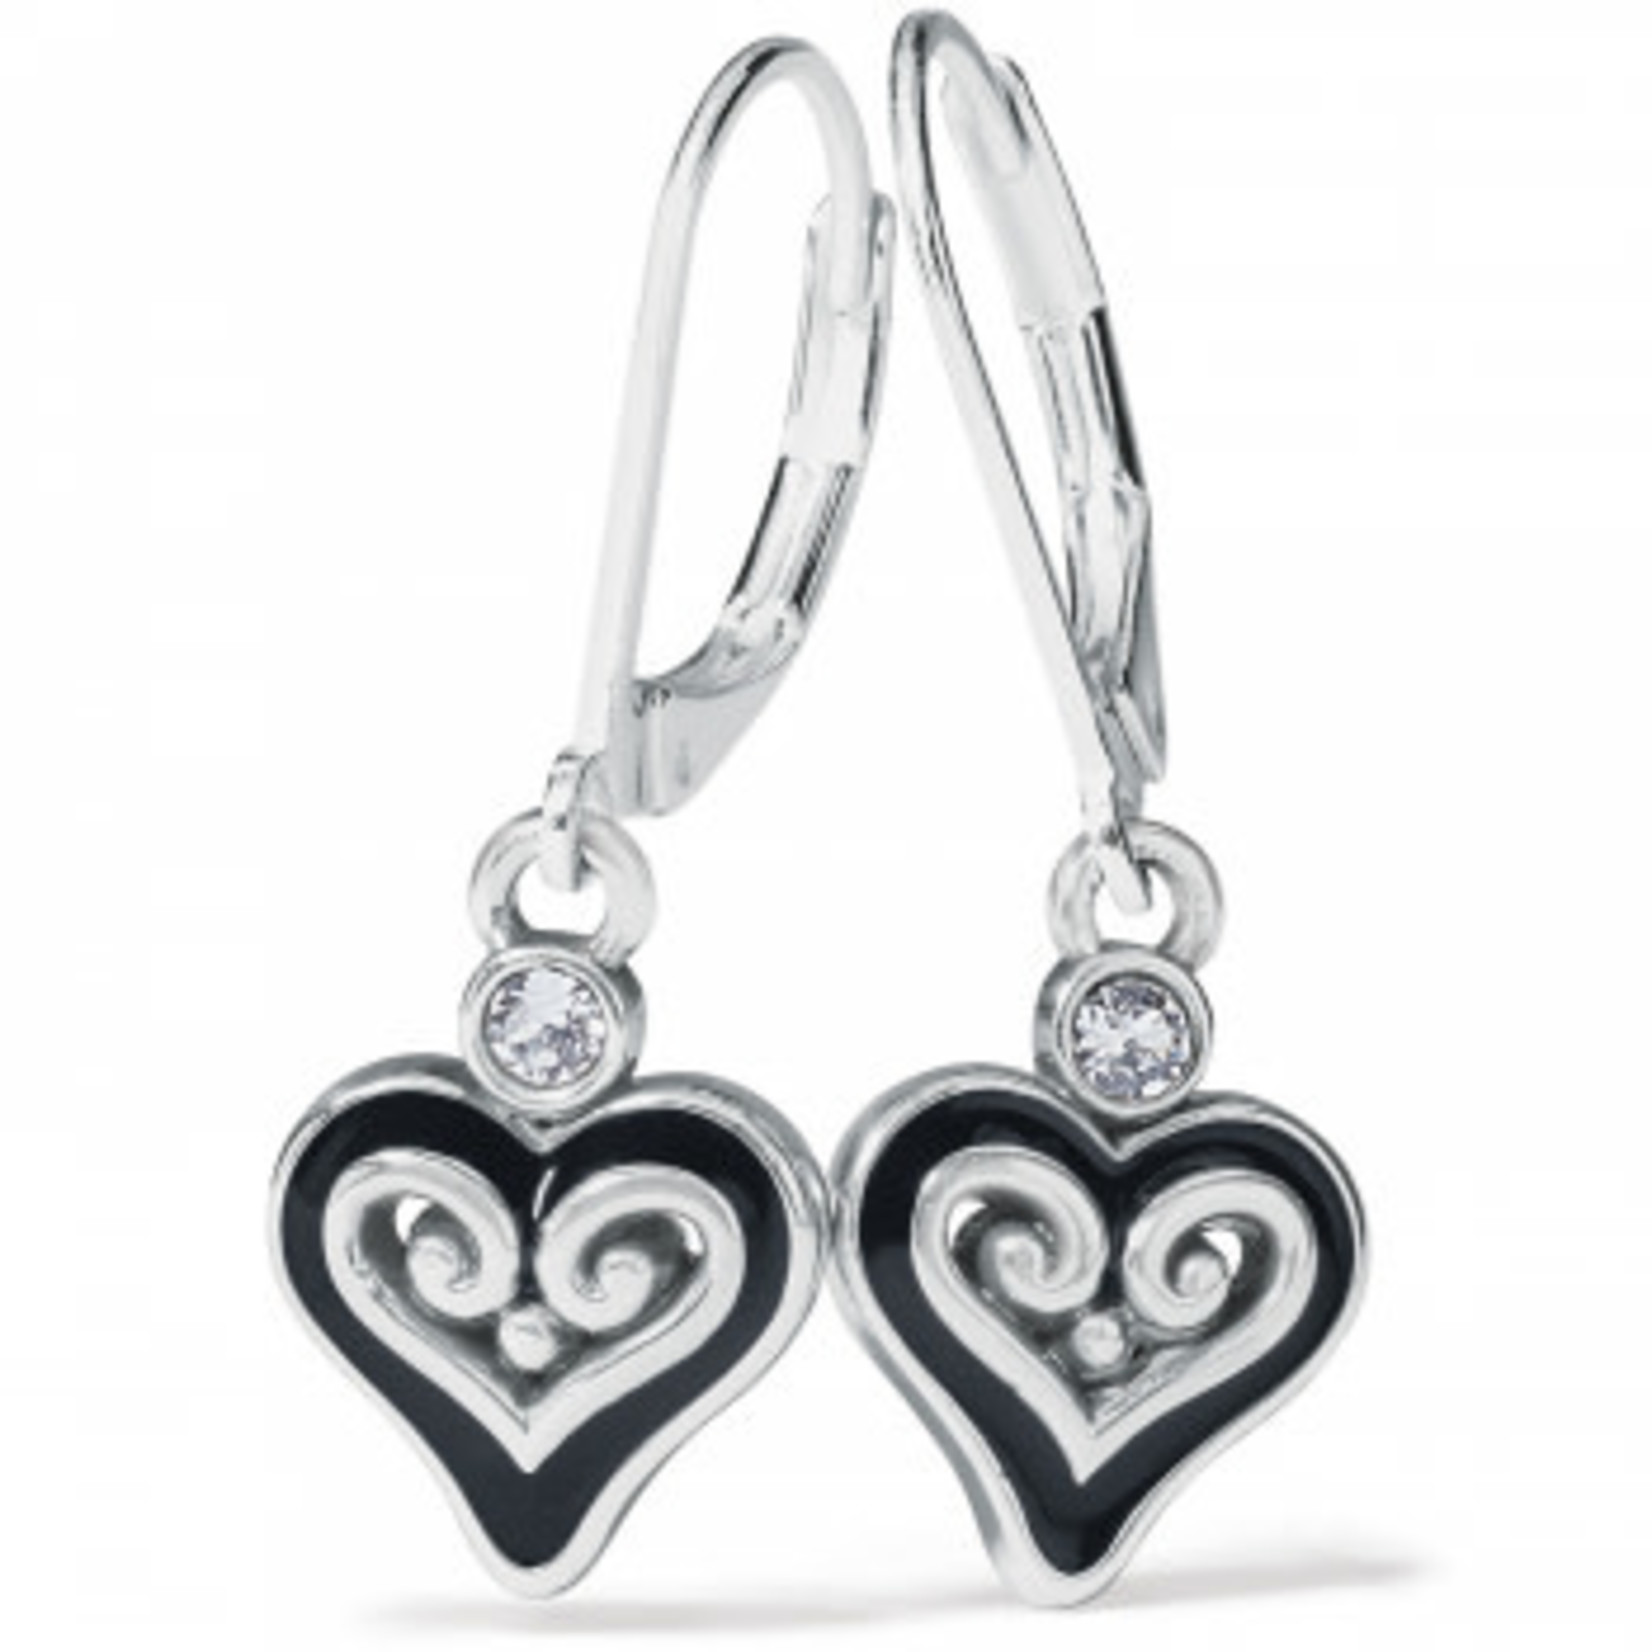 Brighton Alcazar Mystique Heart Leverback Earrings - Silver